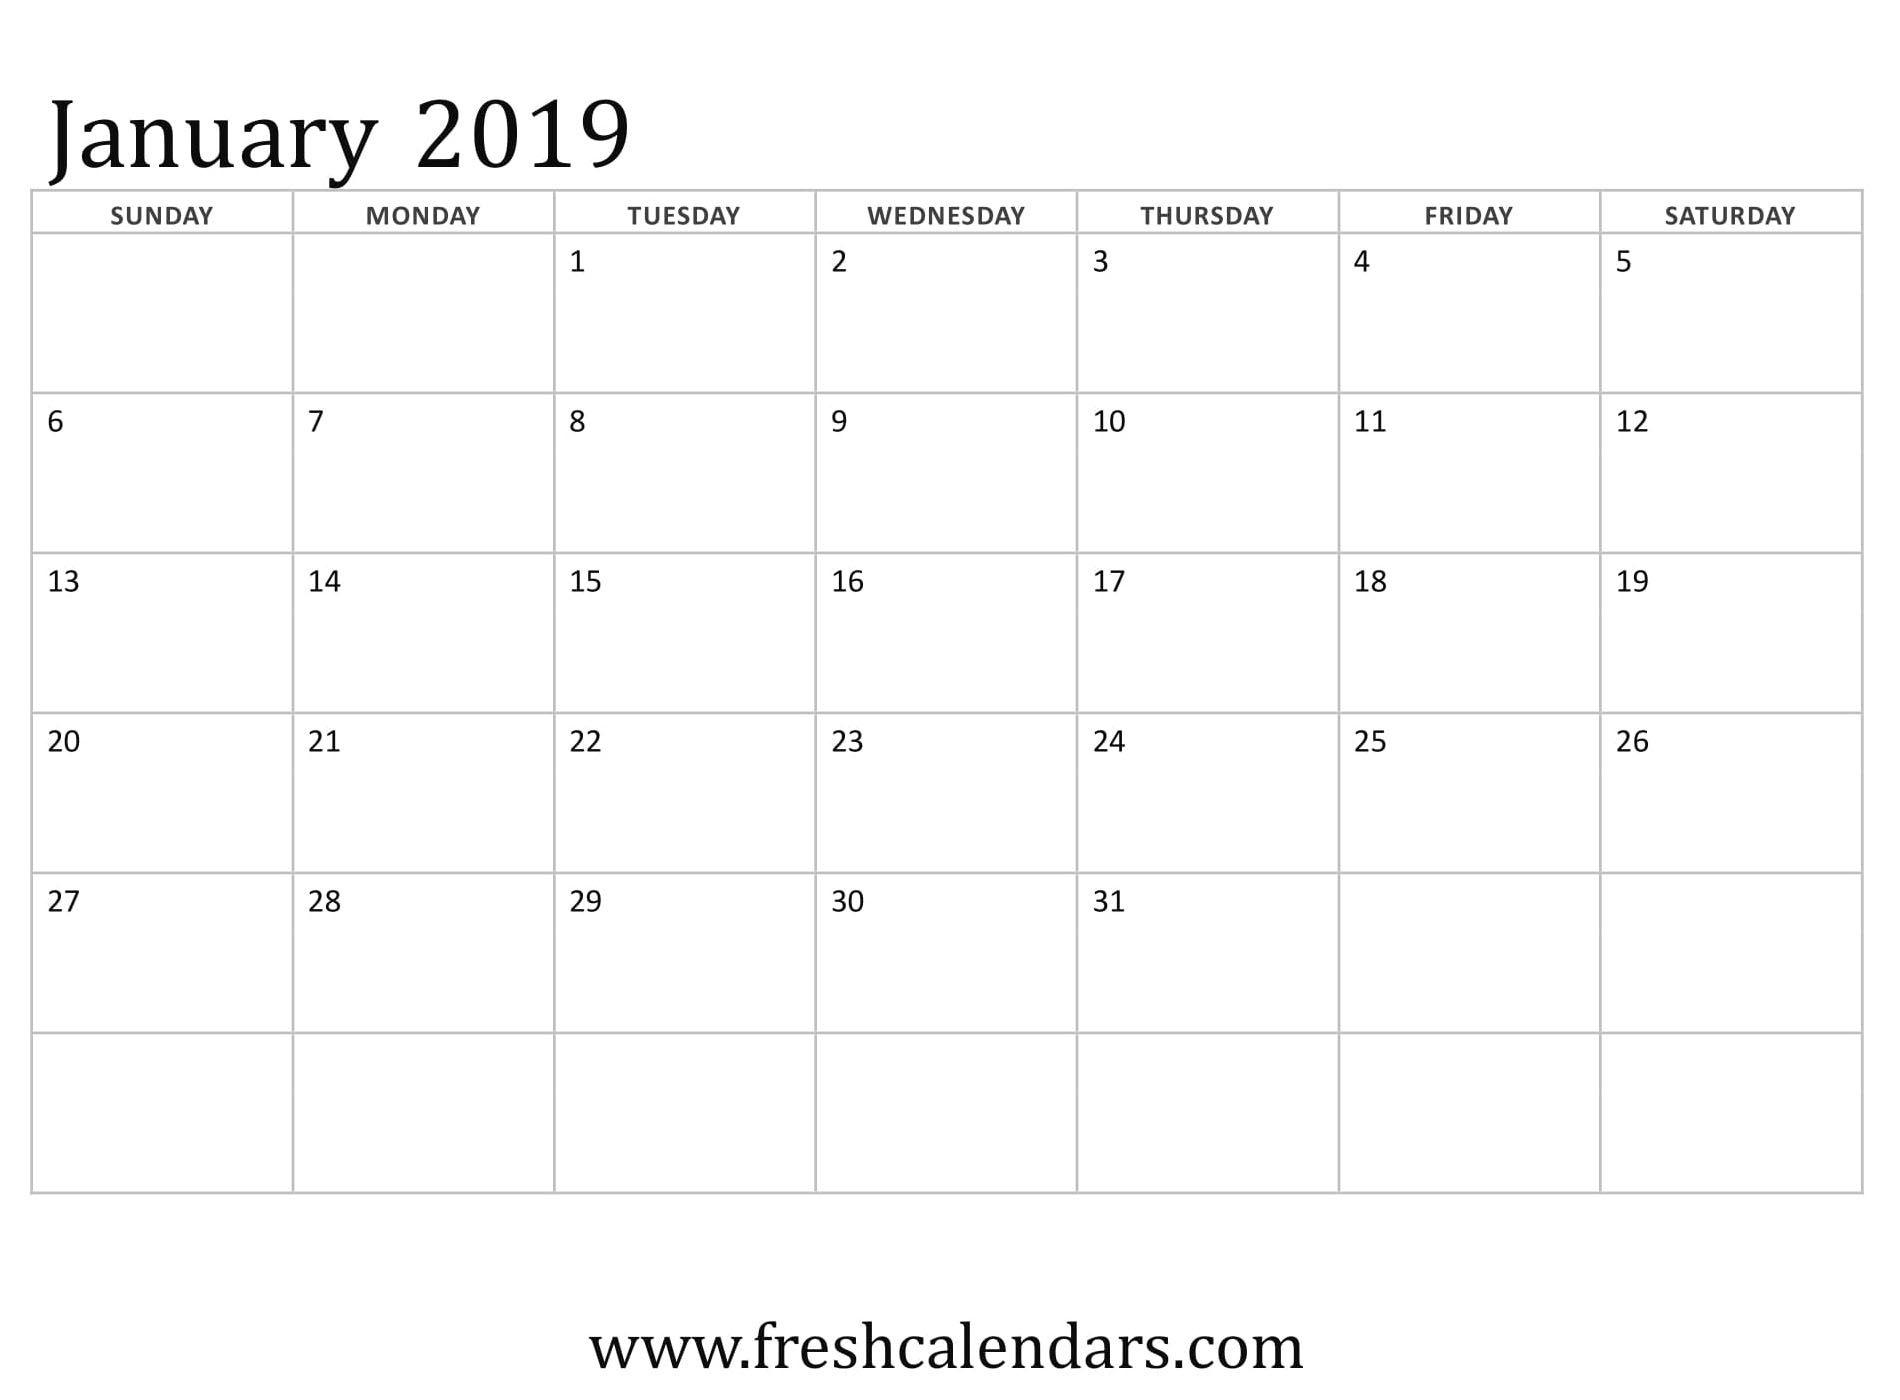 371a1 11x17 calendar template microsoft word | #digital with